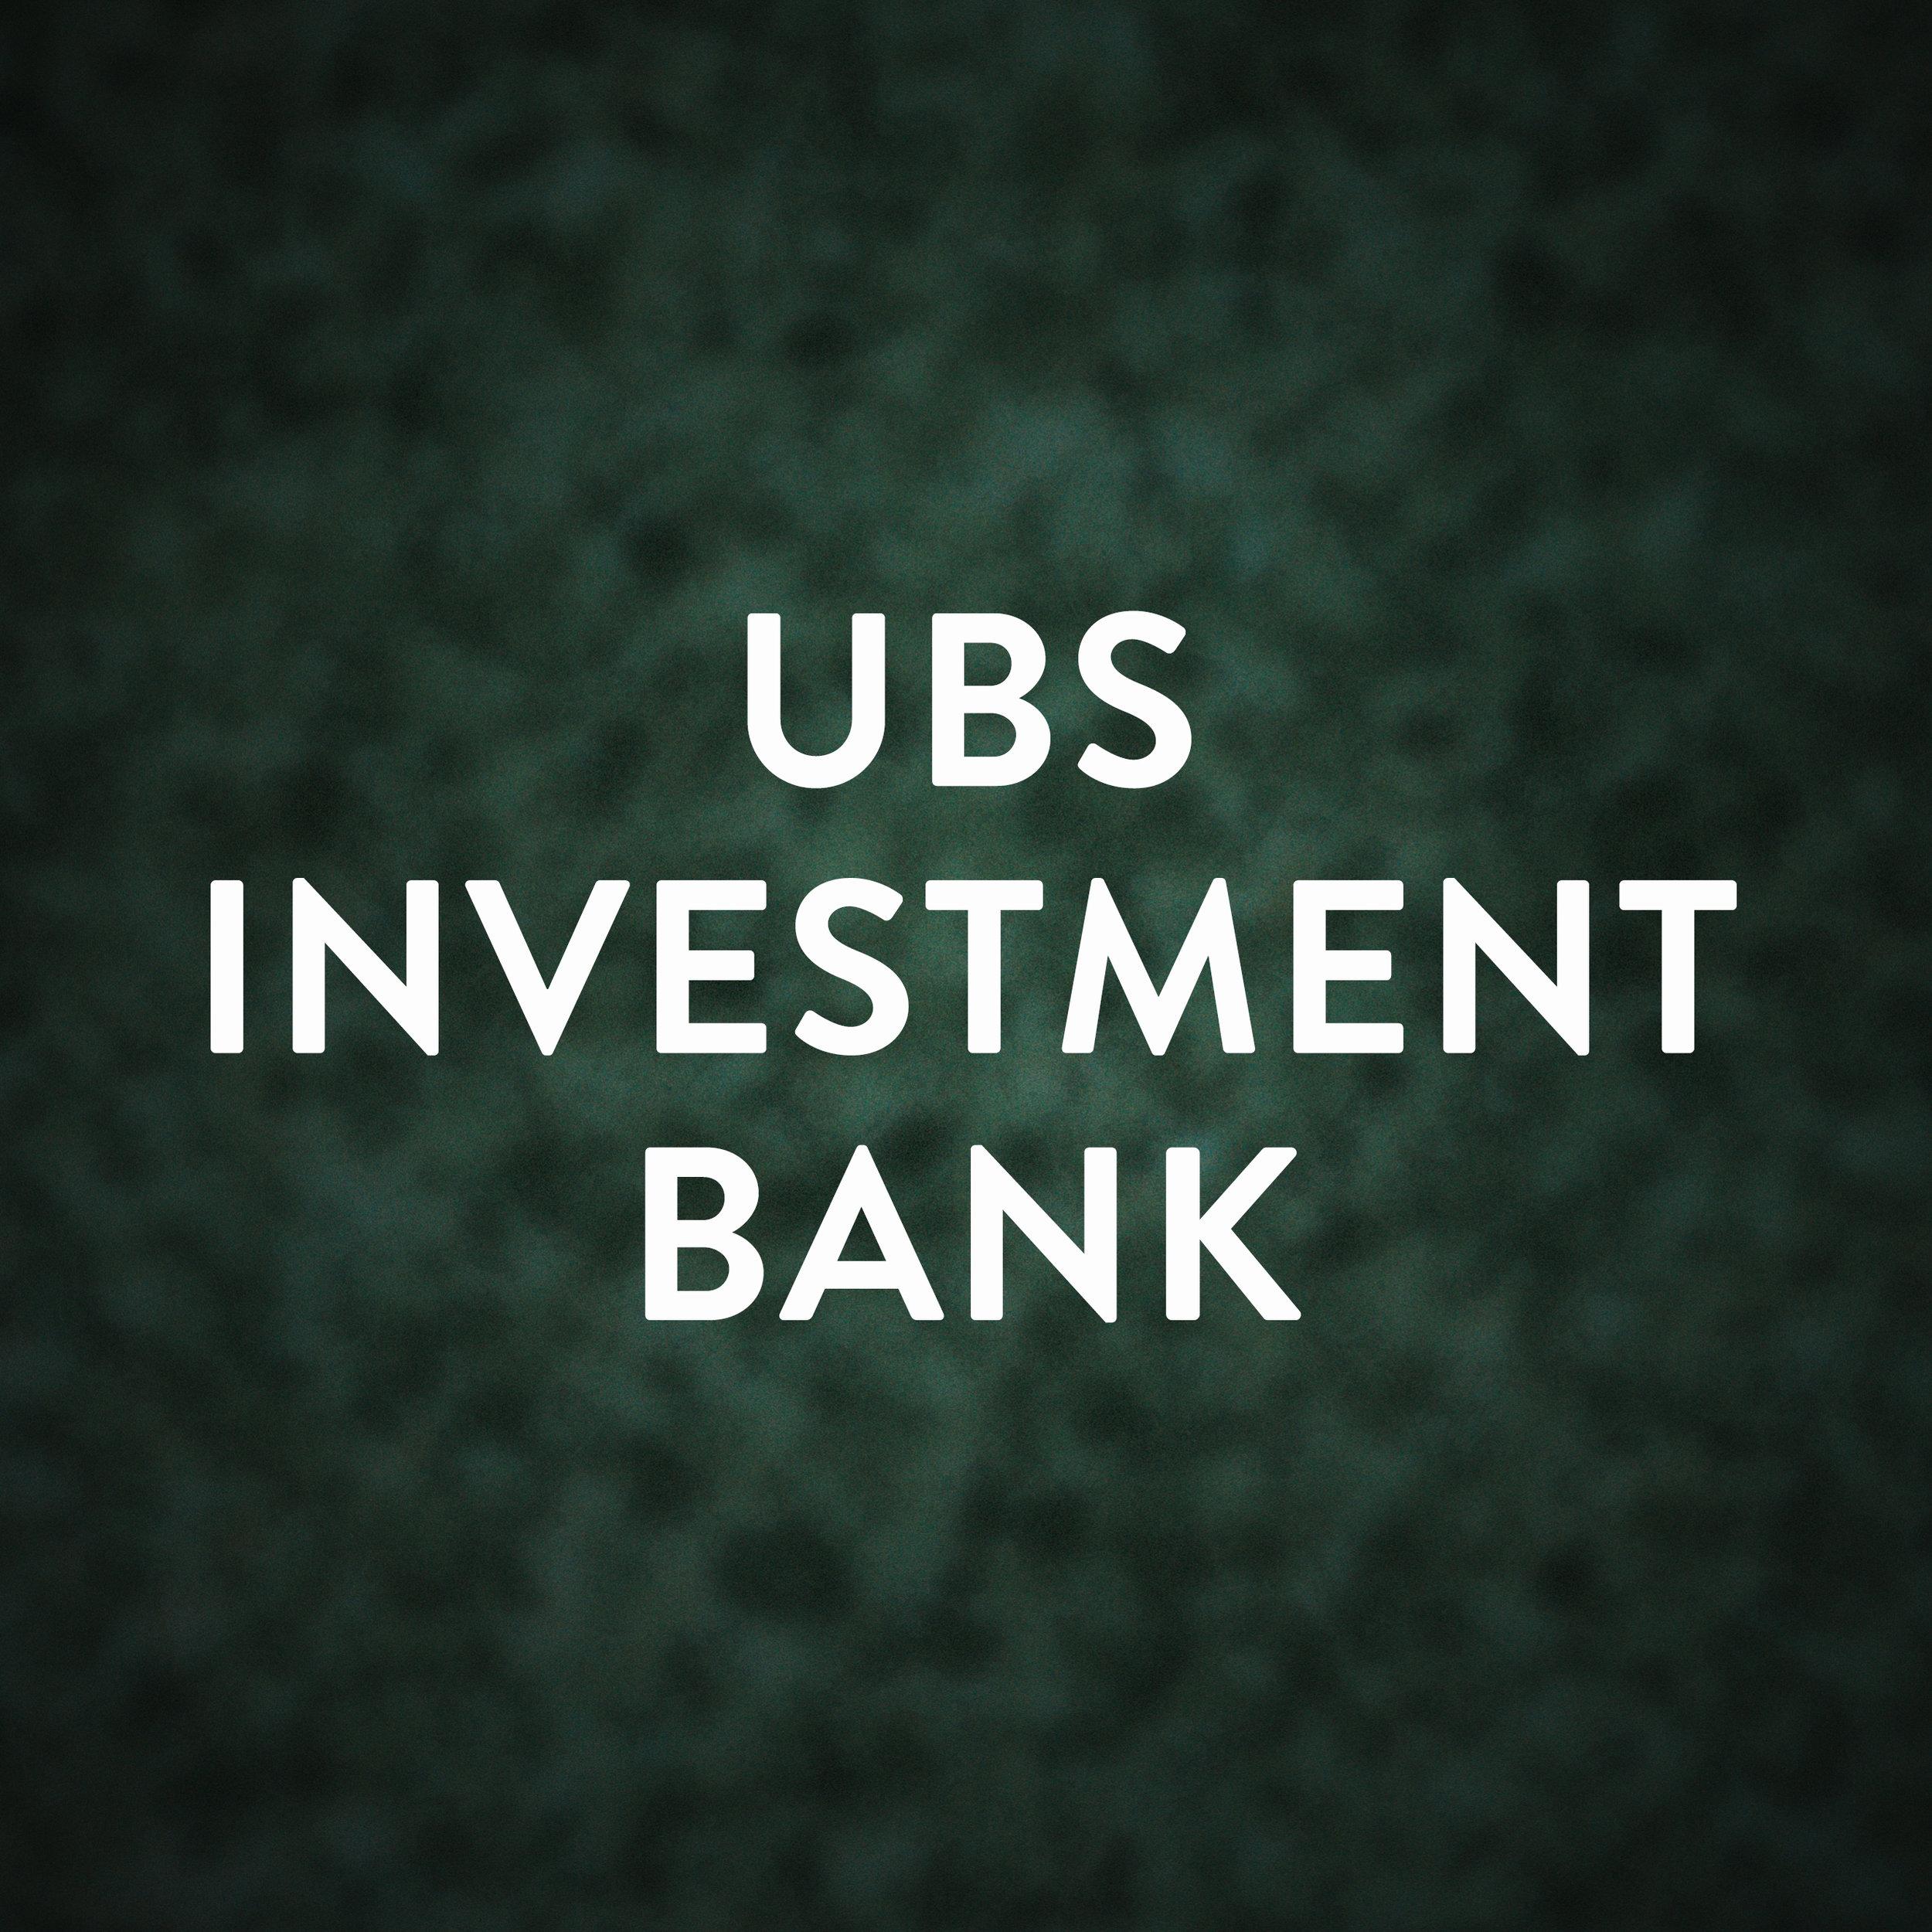 UBS.jpg